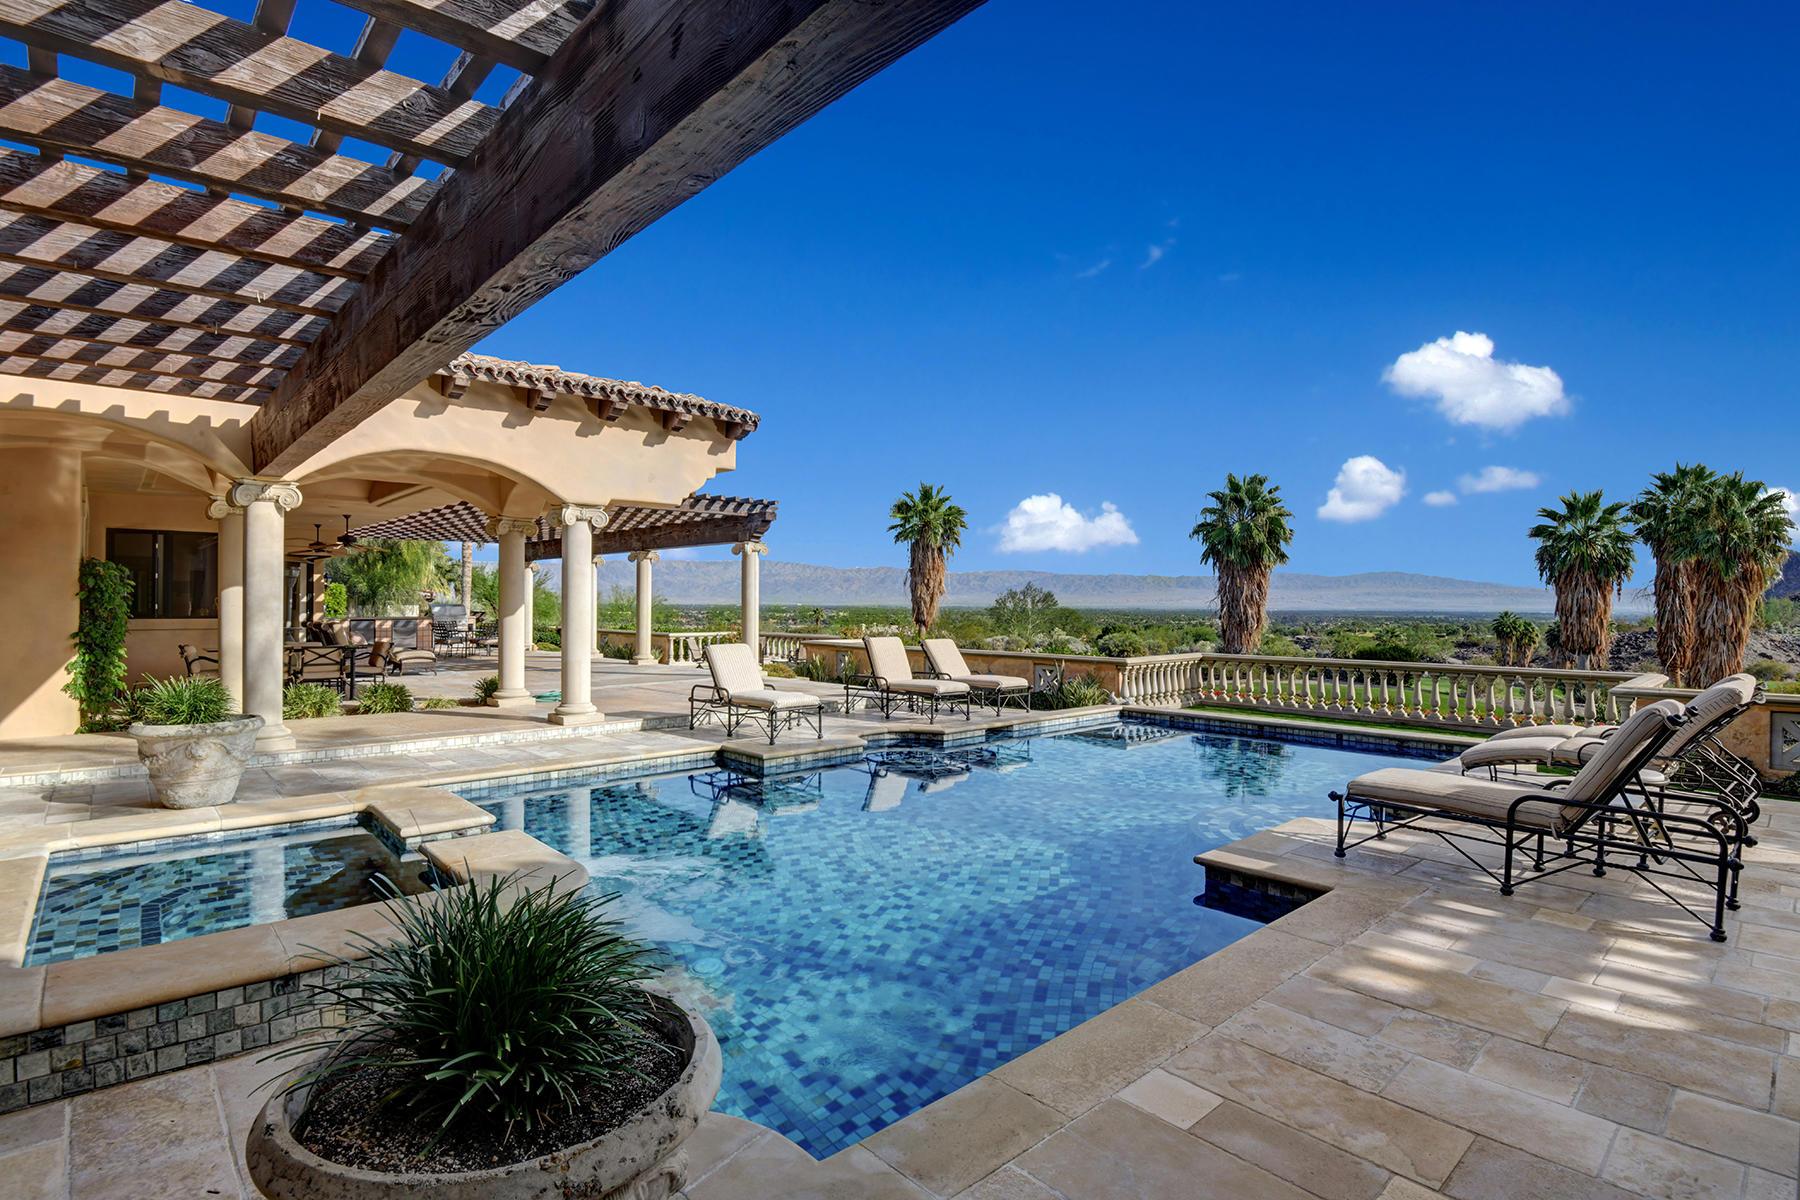 Photo of 79251 Tom Fazio Lane, La Quinta, CA 92253